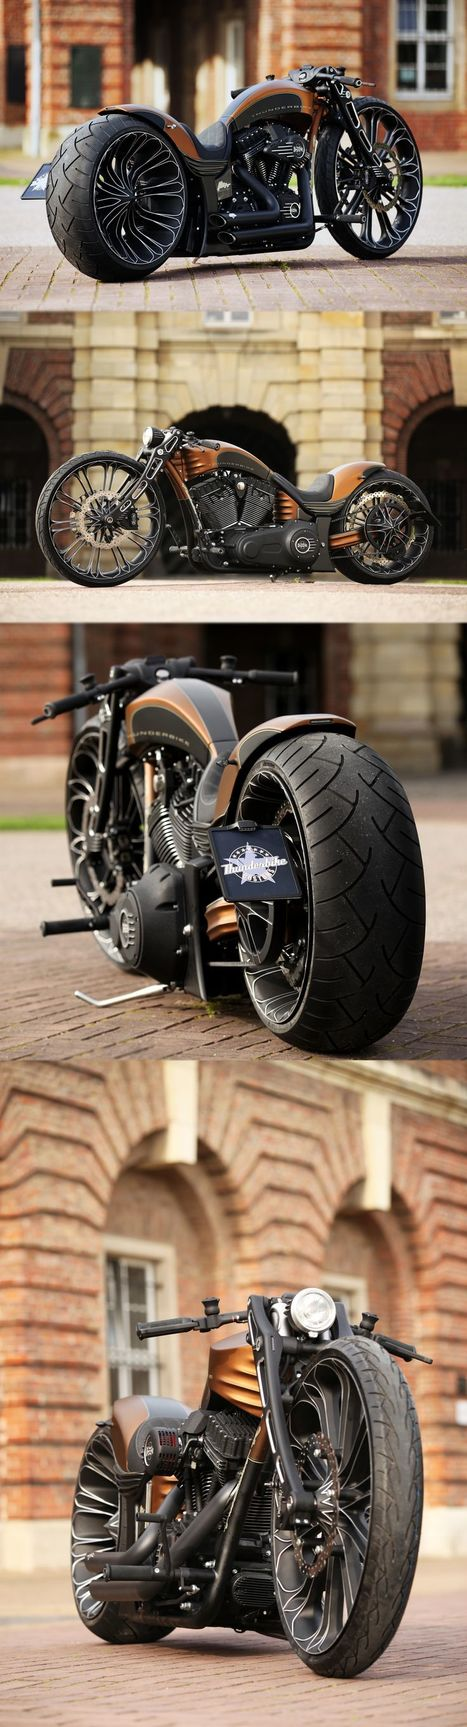 Thunderbike Harley-Davidson - MuchoCars.com | Bikez | Scoop.it